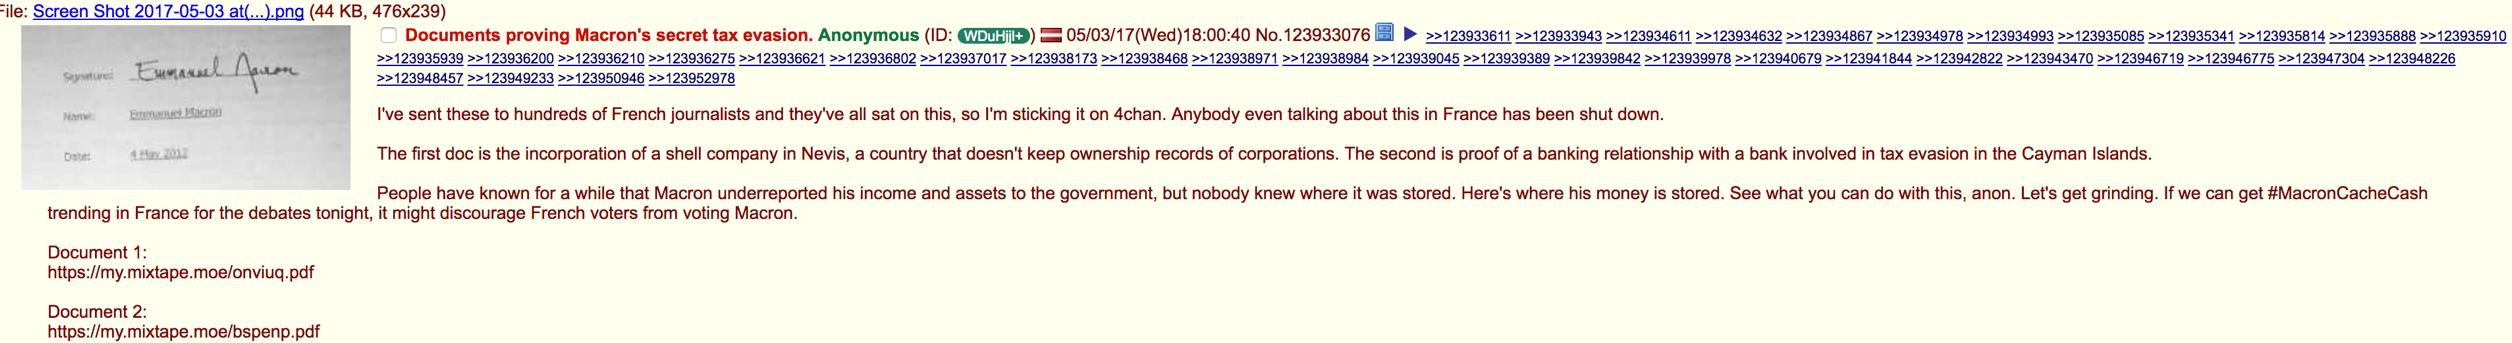 MacronLeaks files on 4Chan